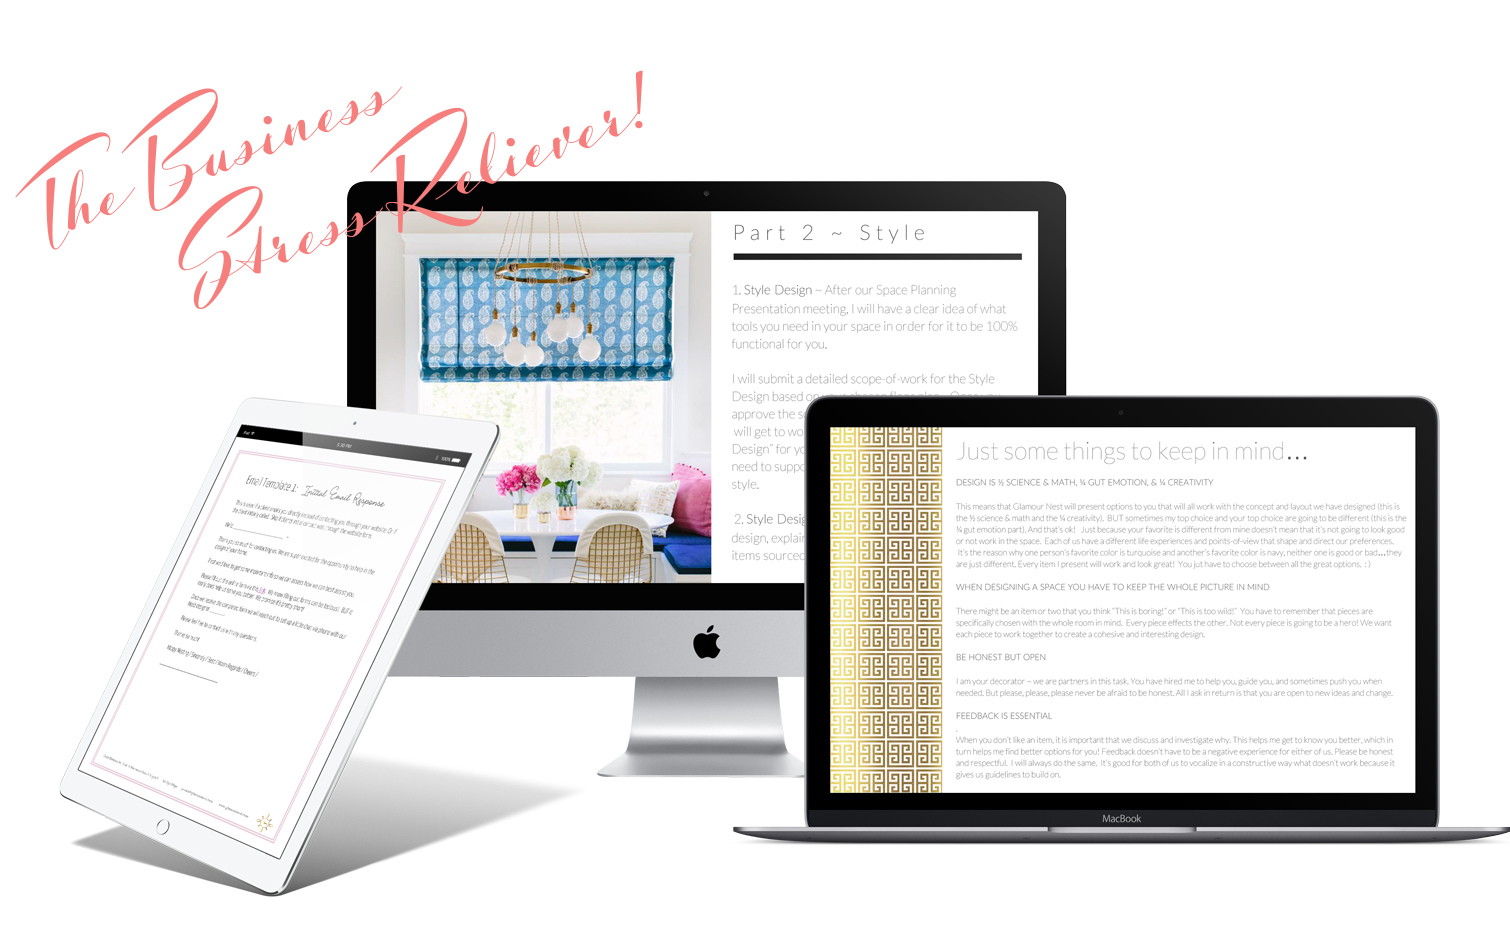 Interior design business coaching | Ms. Glamour Nest Jessica McClendon